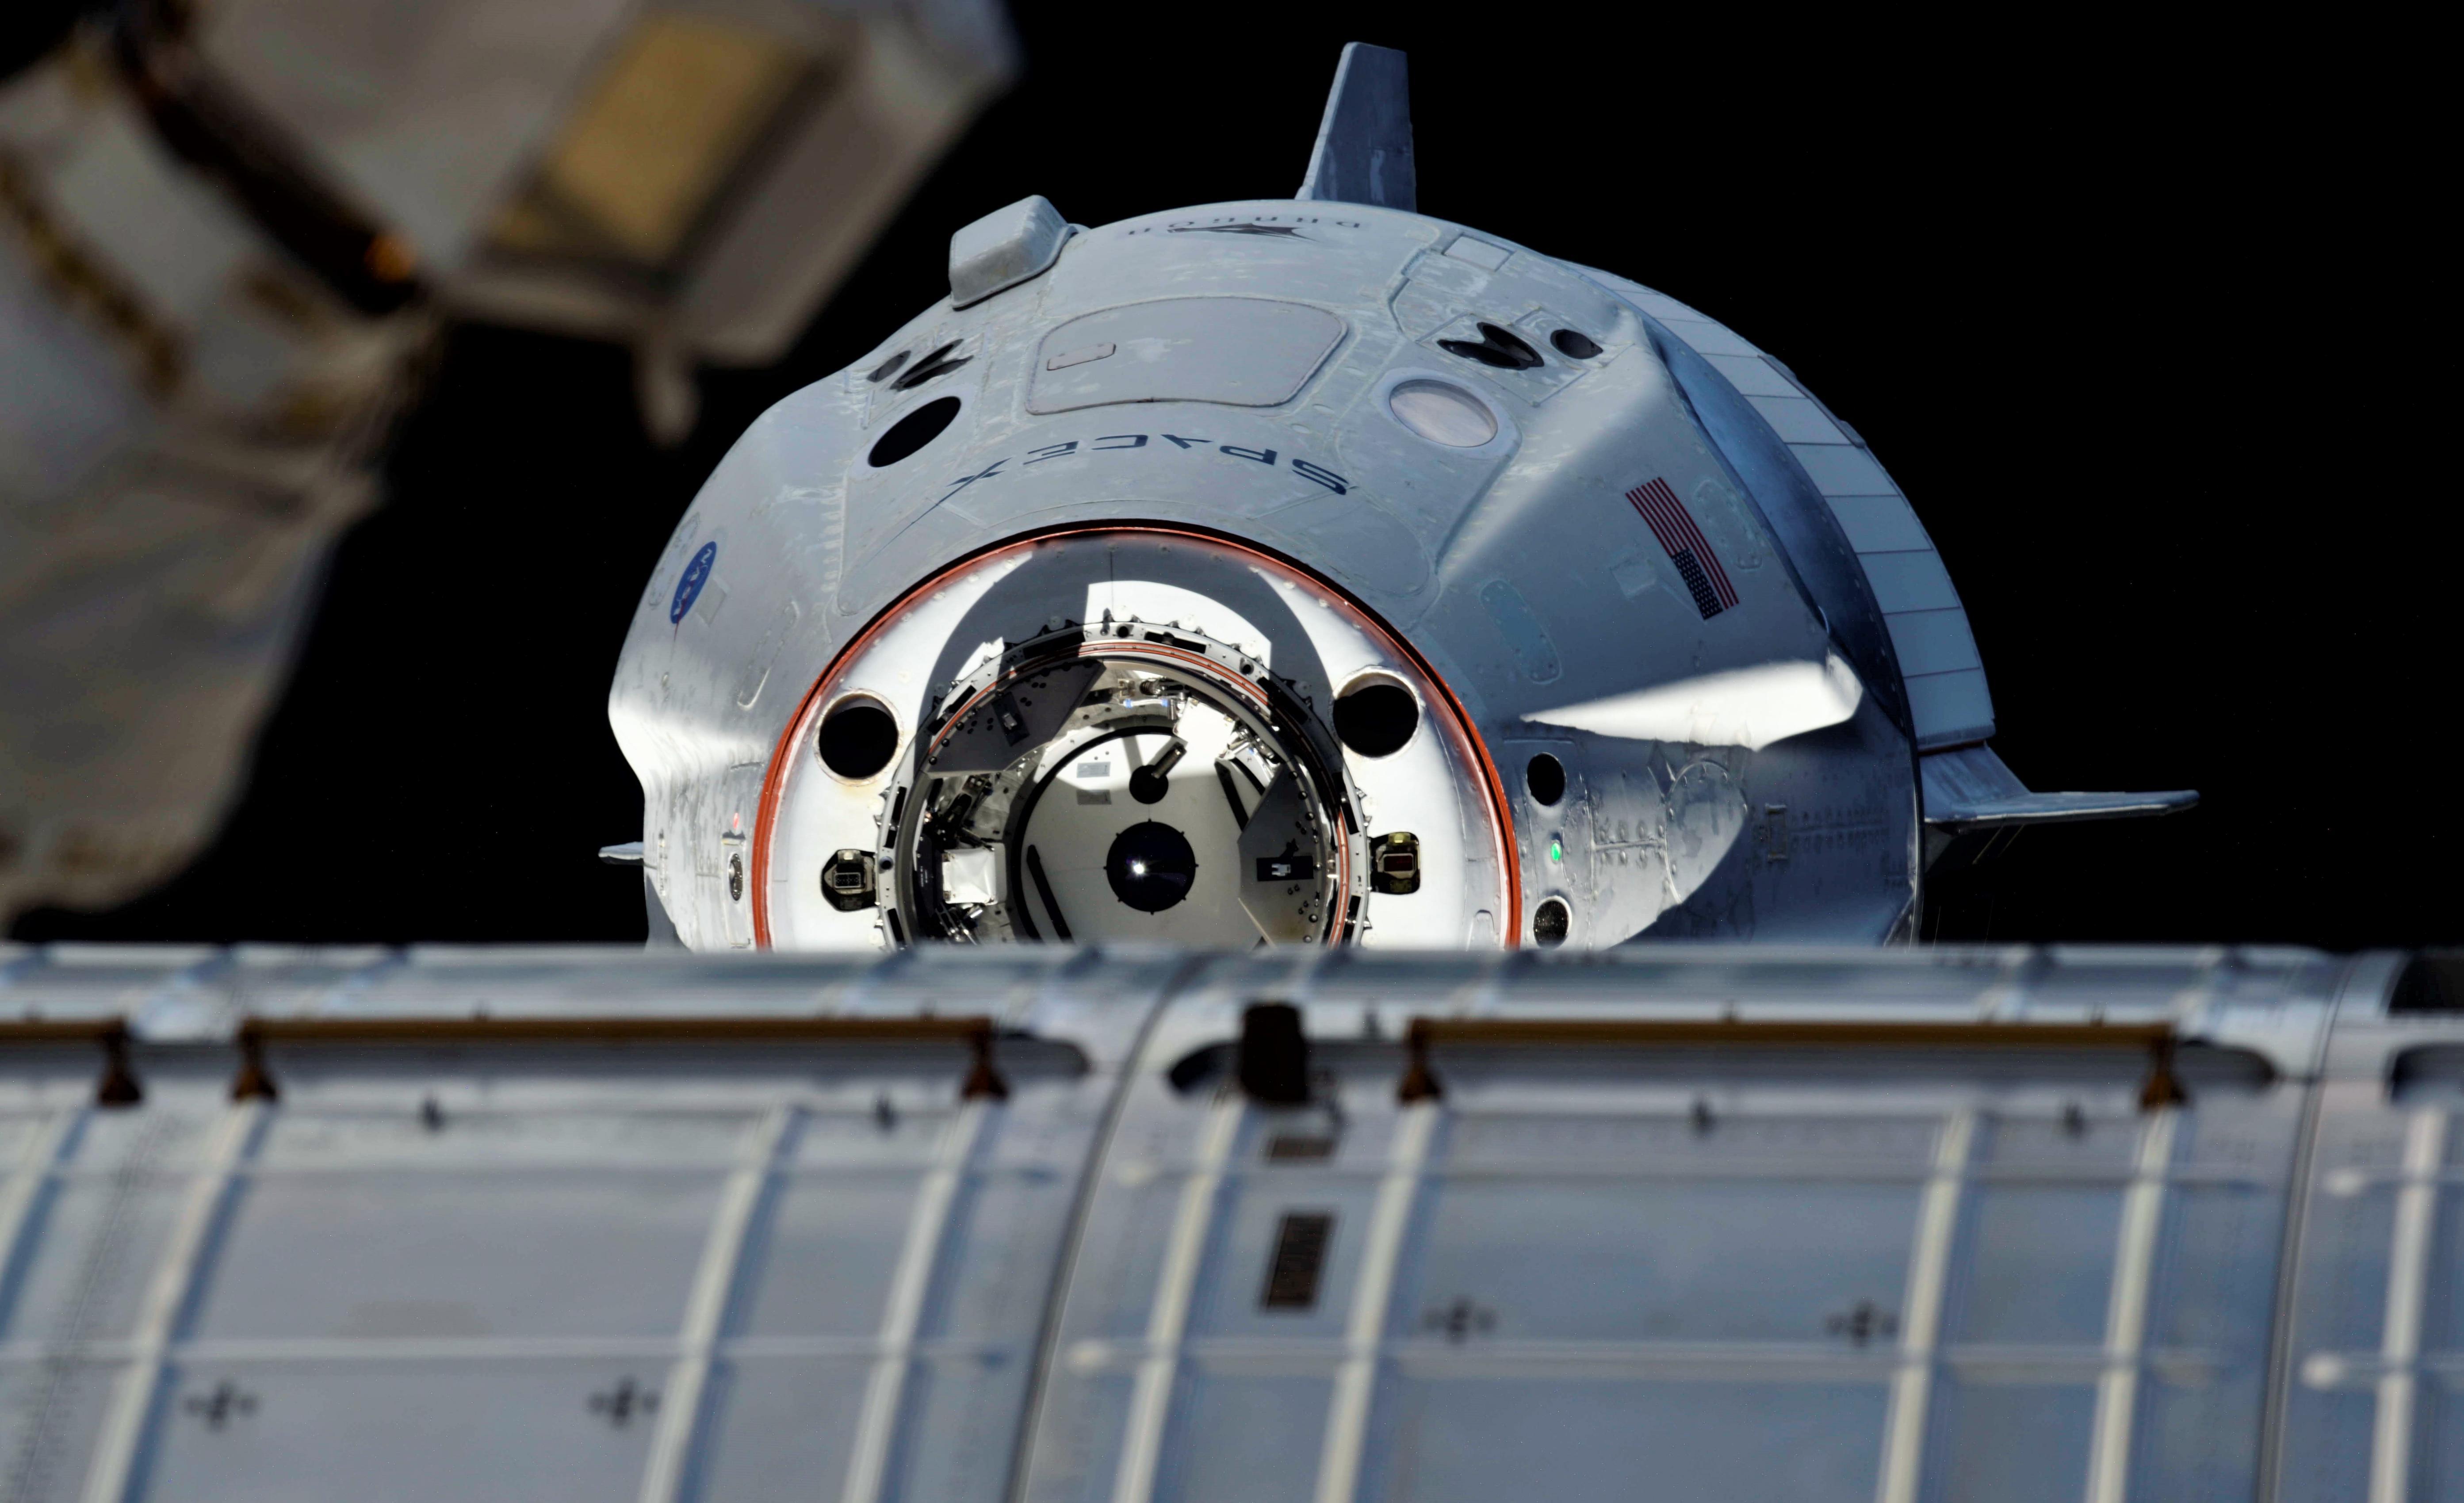 Crew Dragon DM-1 ISS arrival 030319 (Oleg Kononenko) 2 (c)